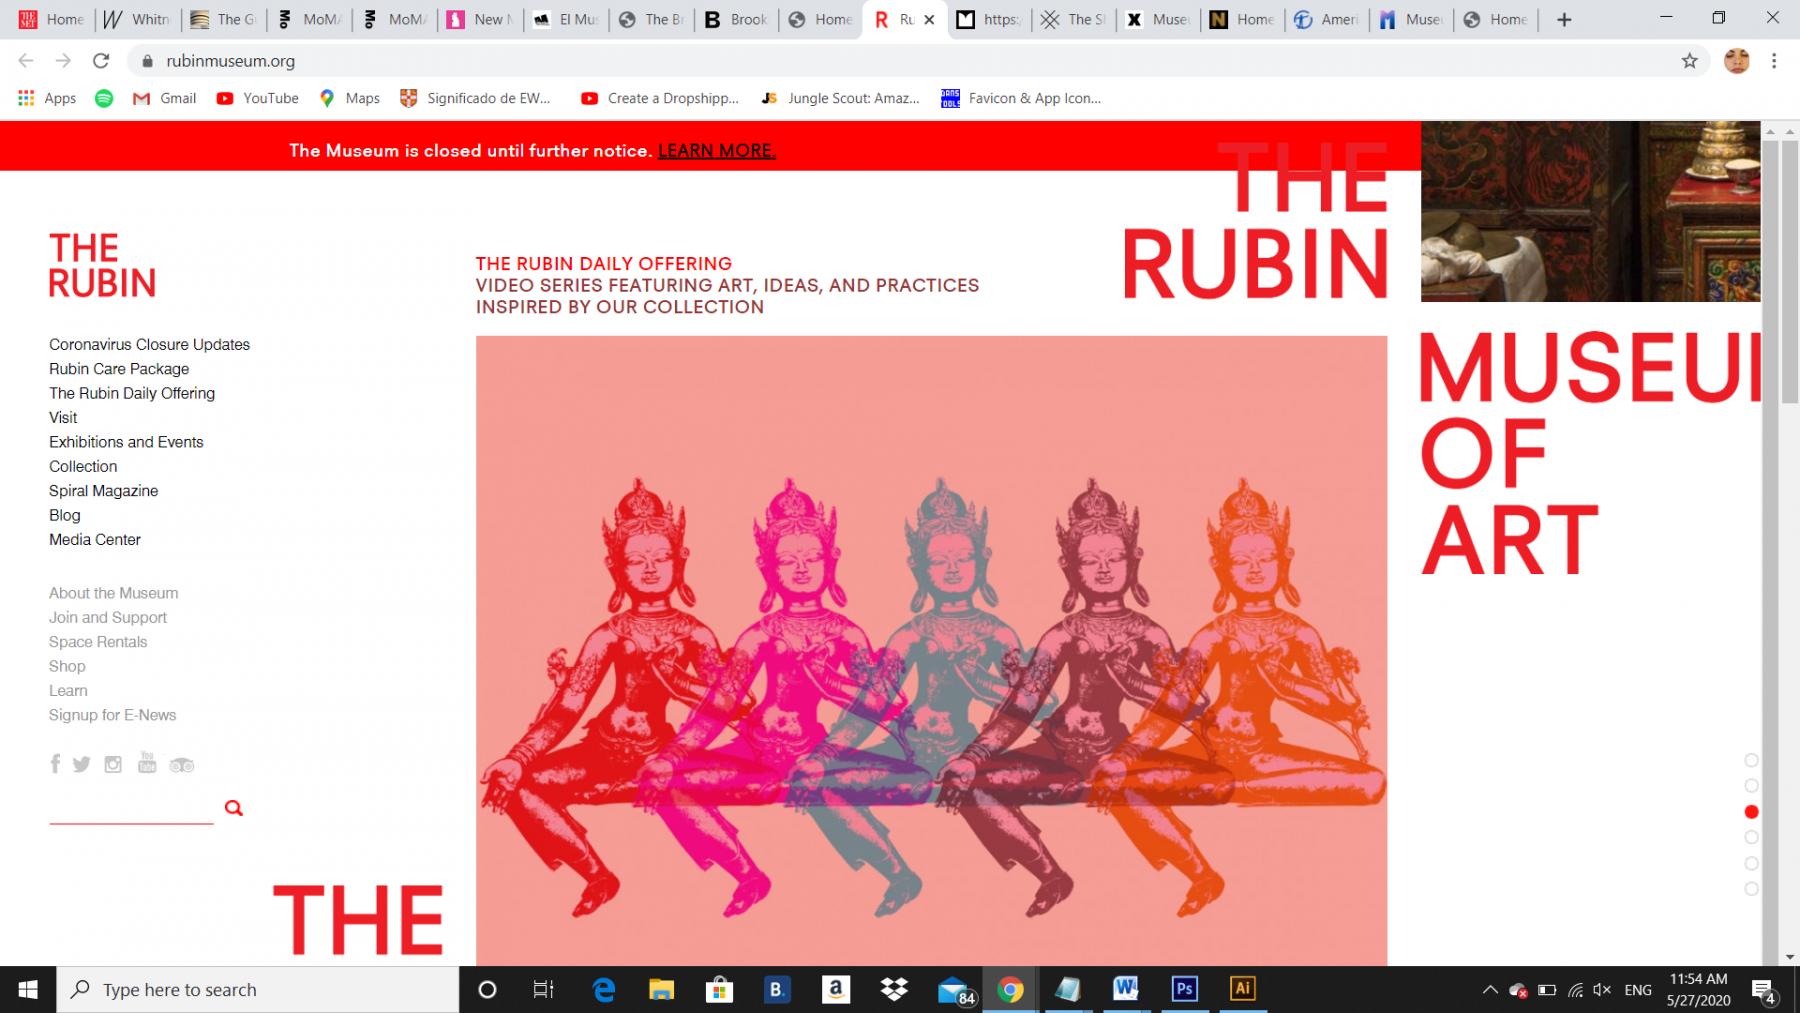 www.rubinmuseum.org-2020-Photography-Naivy-Perez